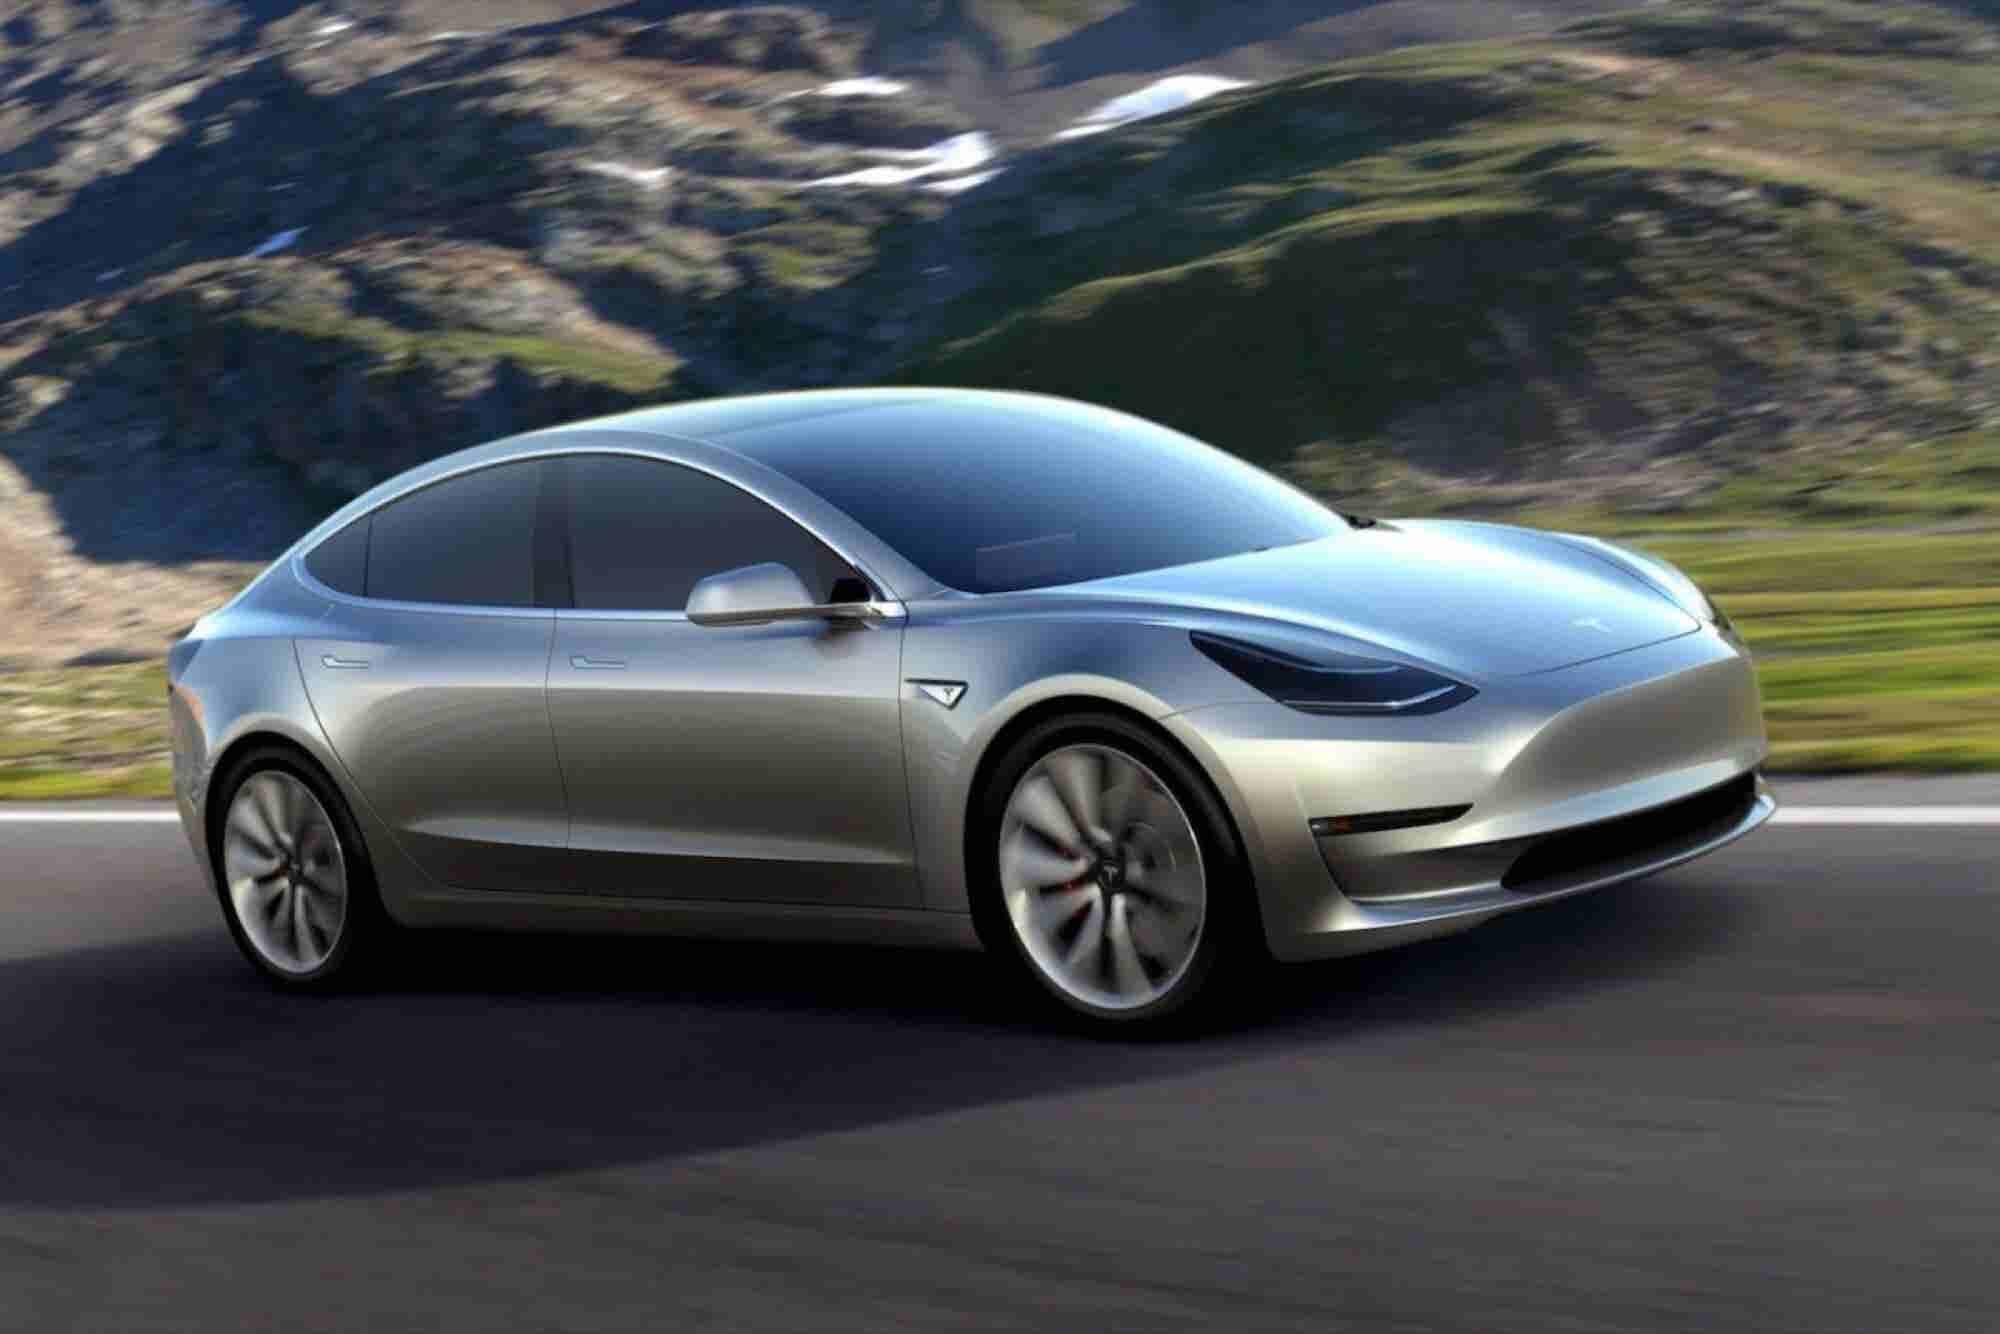 Tesla Sues Former Employee for Stealing 'Hundreds of Gigabytes' of Data